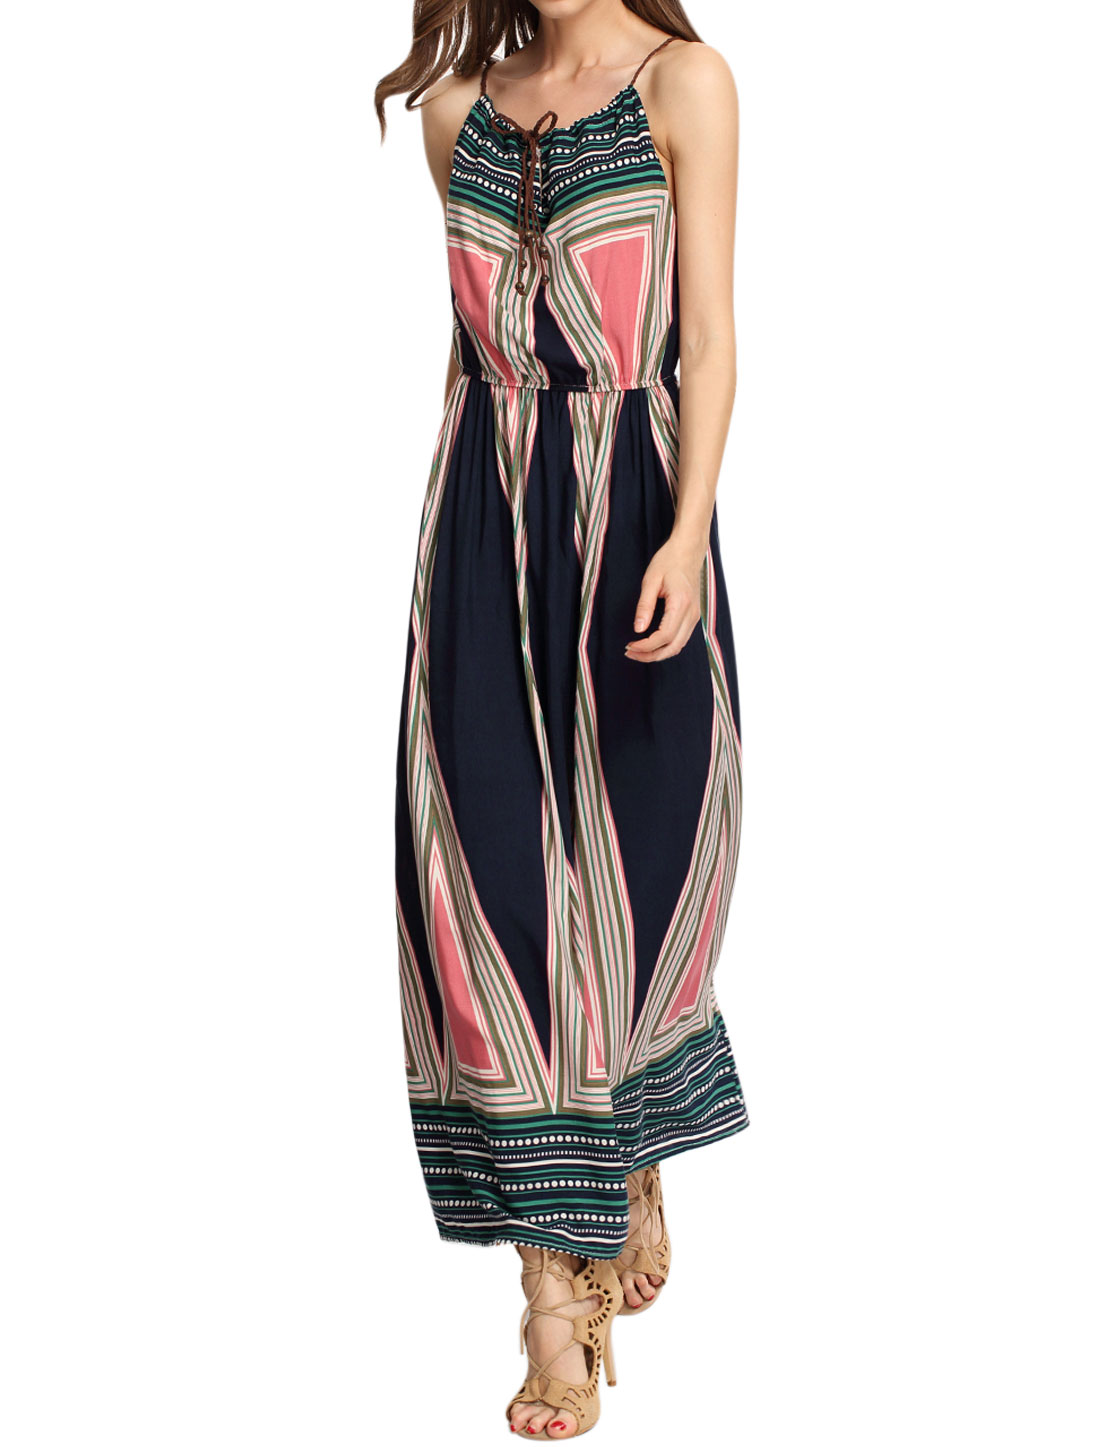 Women Braided Straps Geometric Prints Elastic Waist Boho Dress Multi-color XS